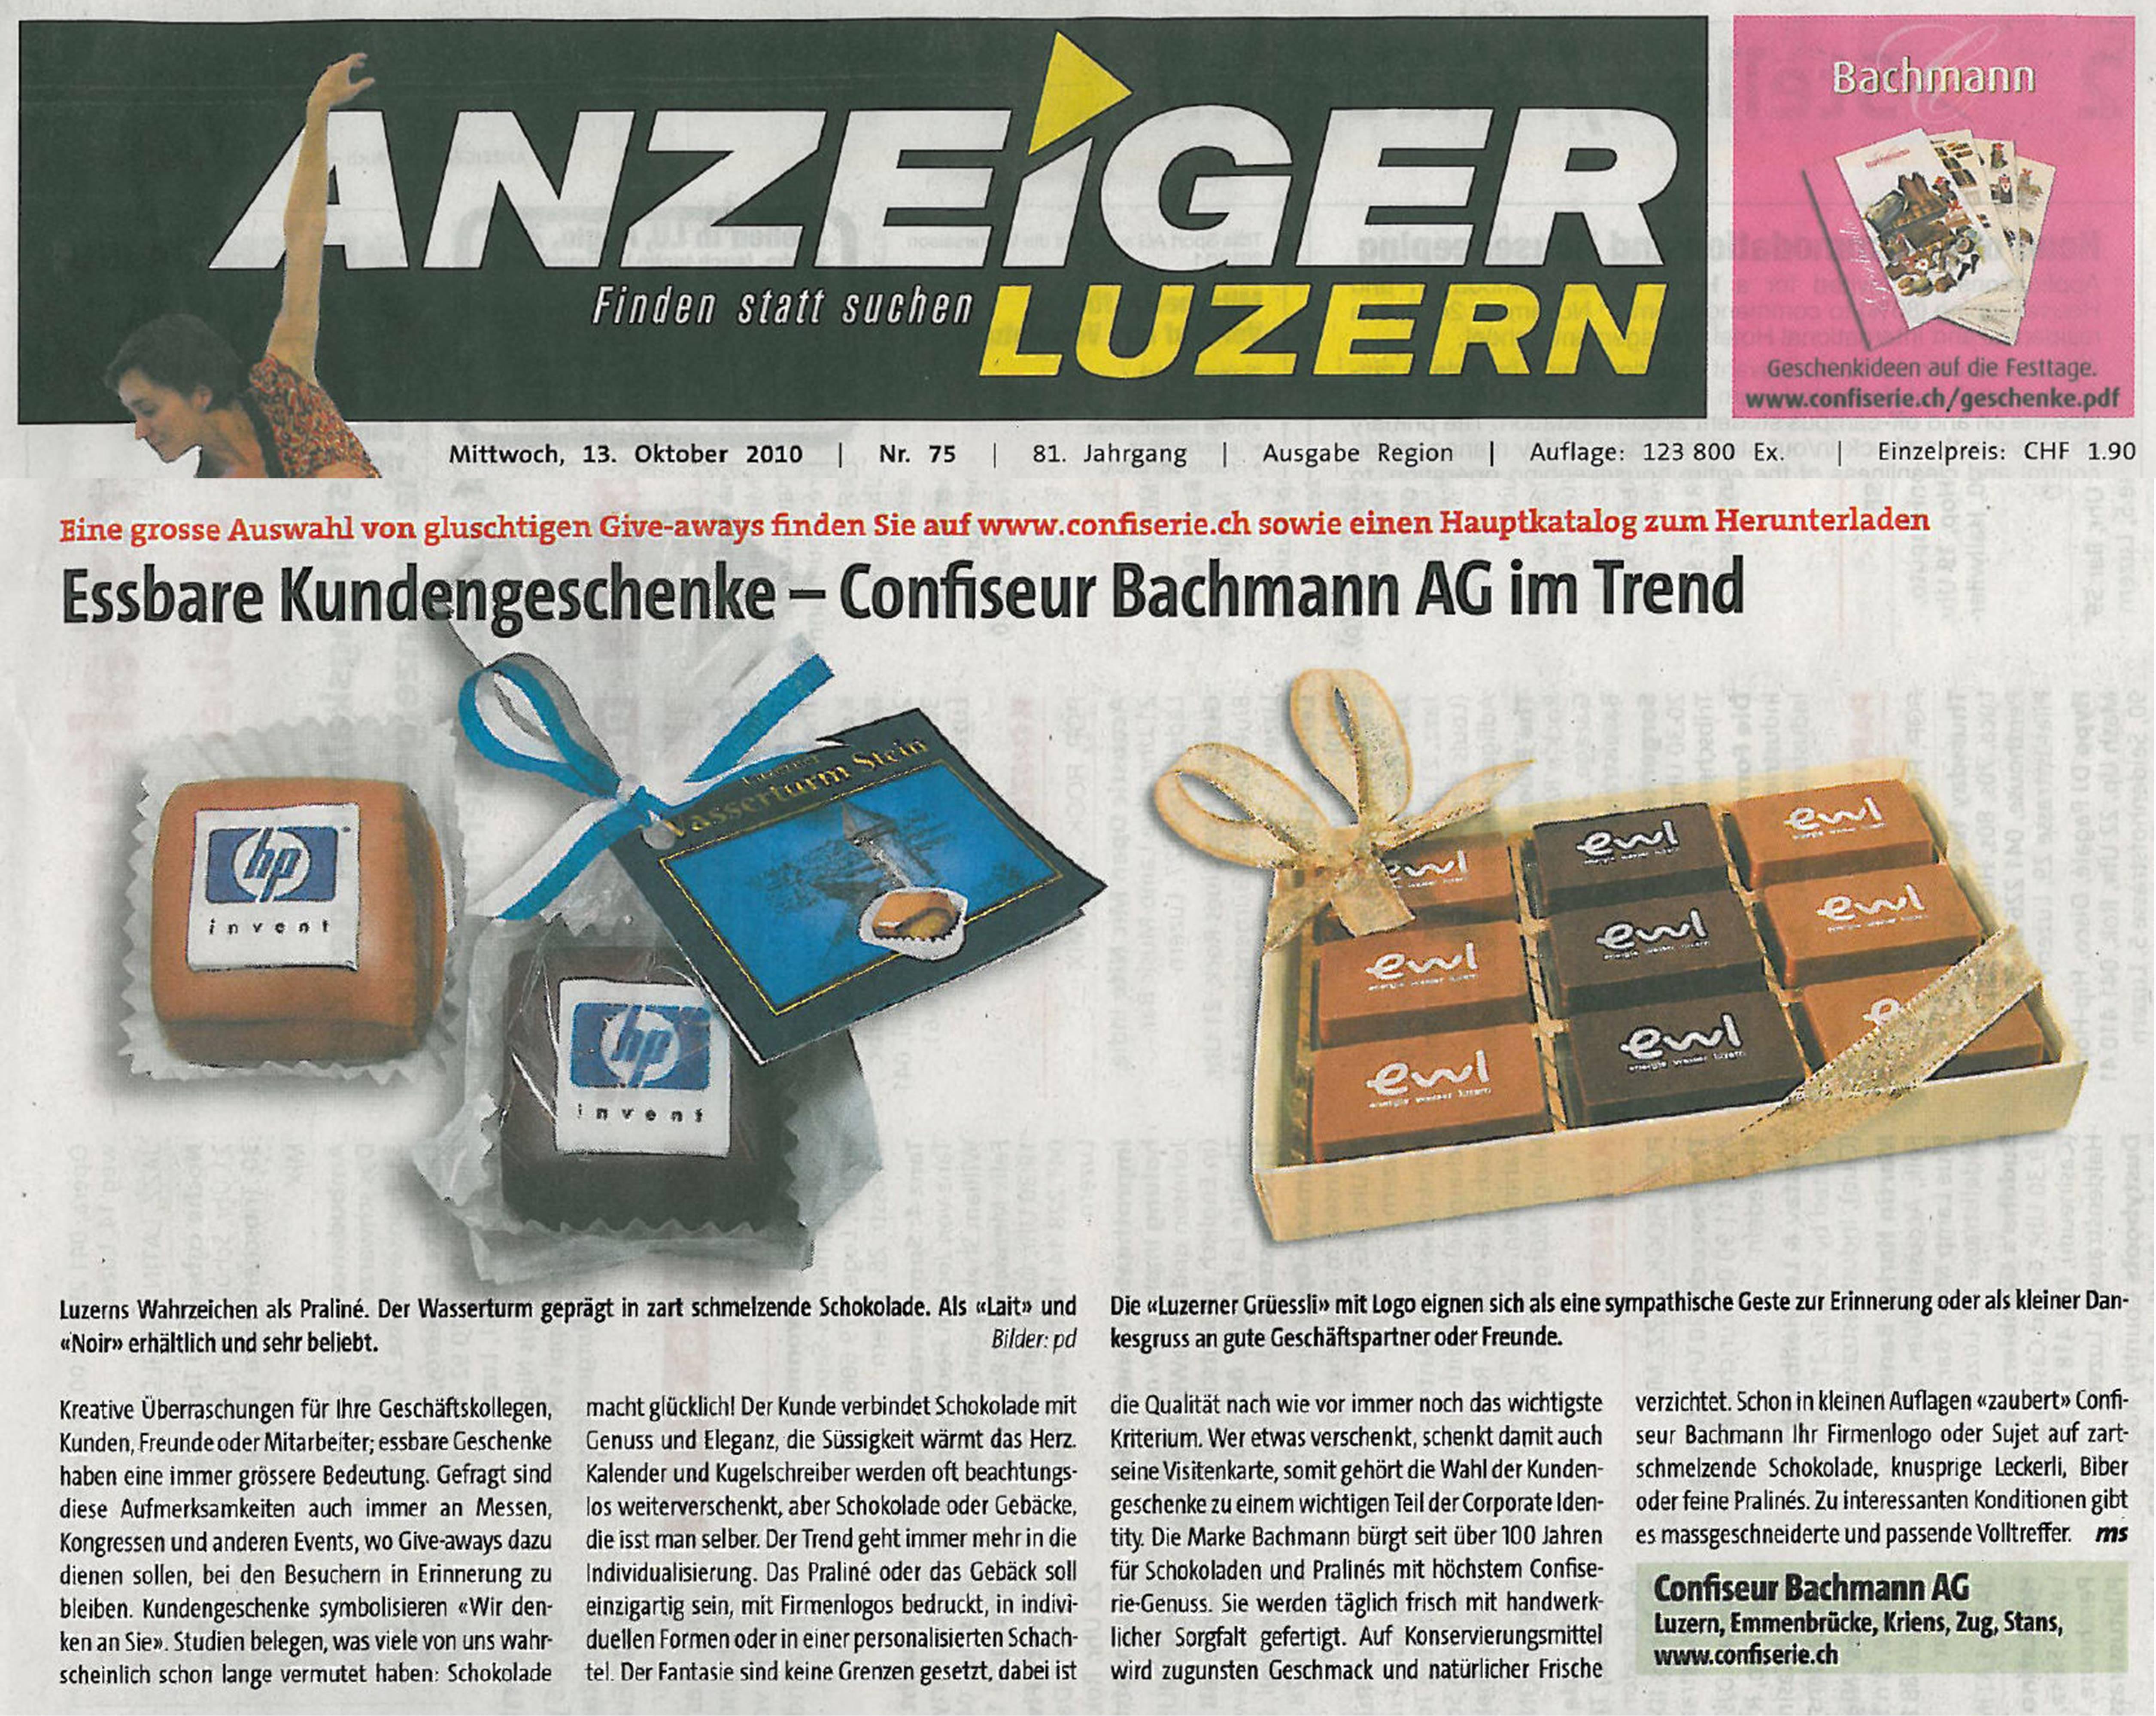 weihnacht confiserie bachmann presse medien berichte. Black Bedroom Furniture Sets. Home Design Ideas